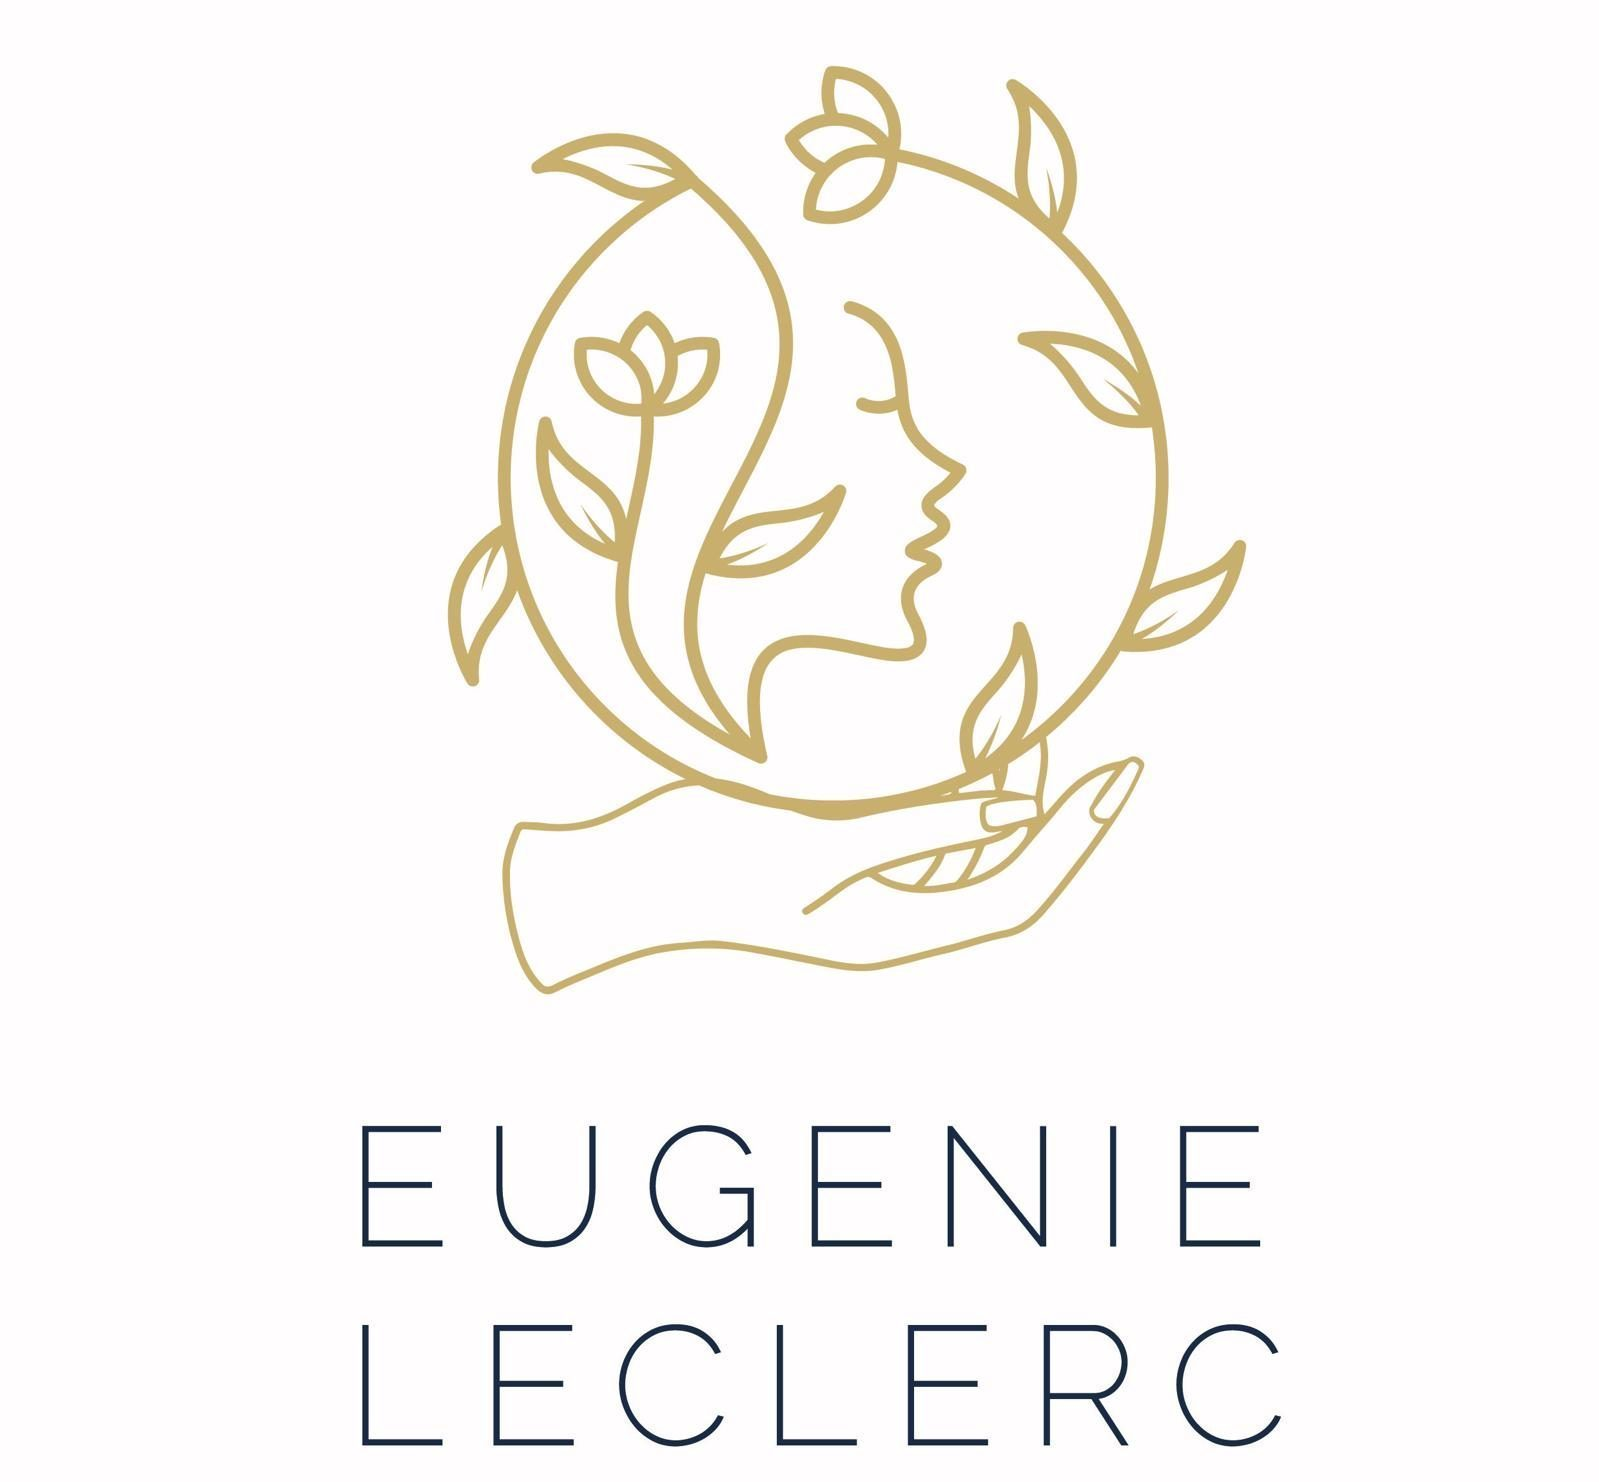 Eugénie Leclerc